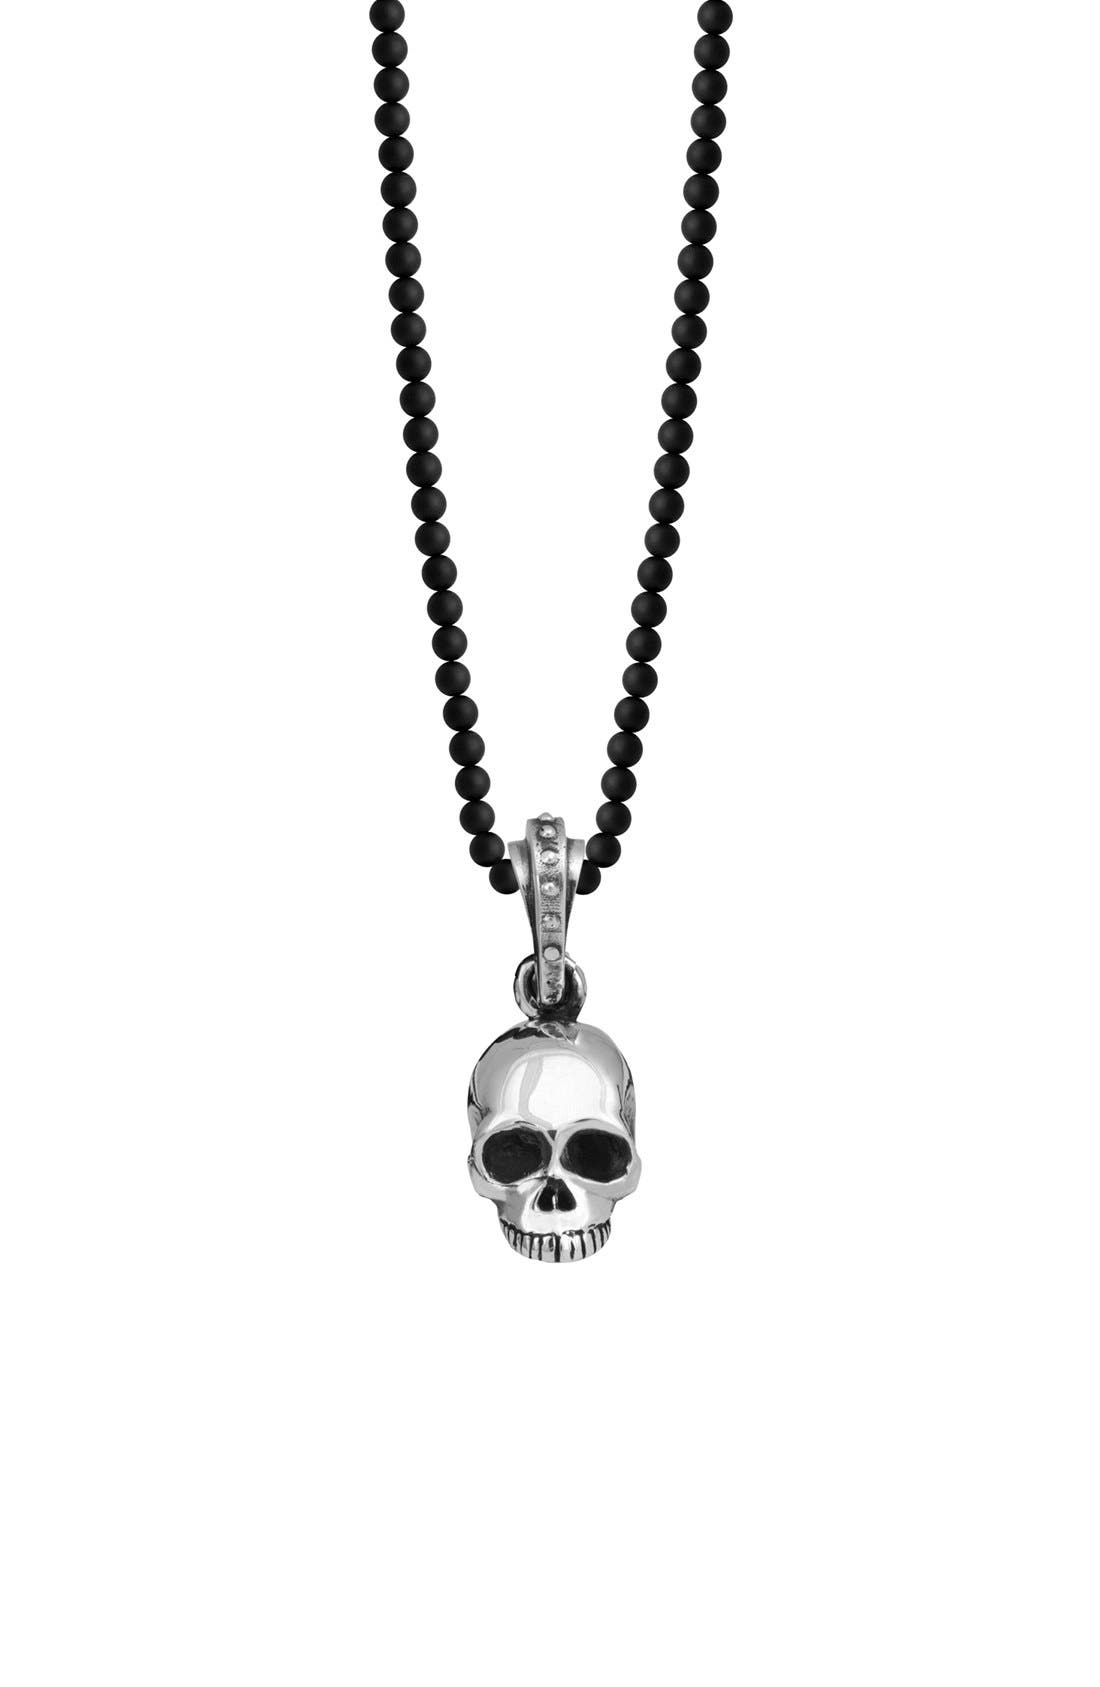 'Hamlet' Sterling Silver & Onyx Skull Pendant Necklace